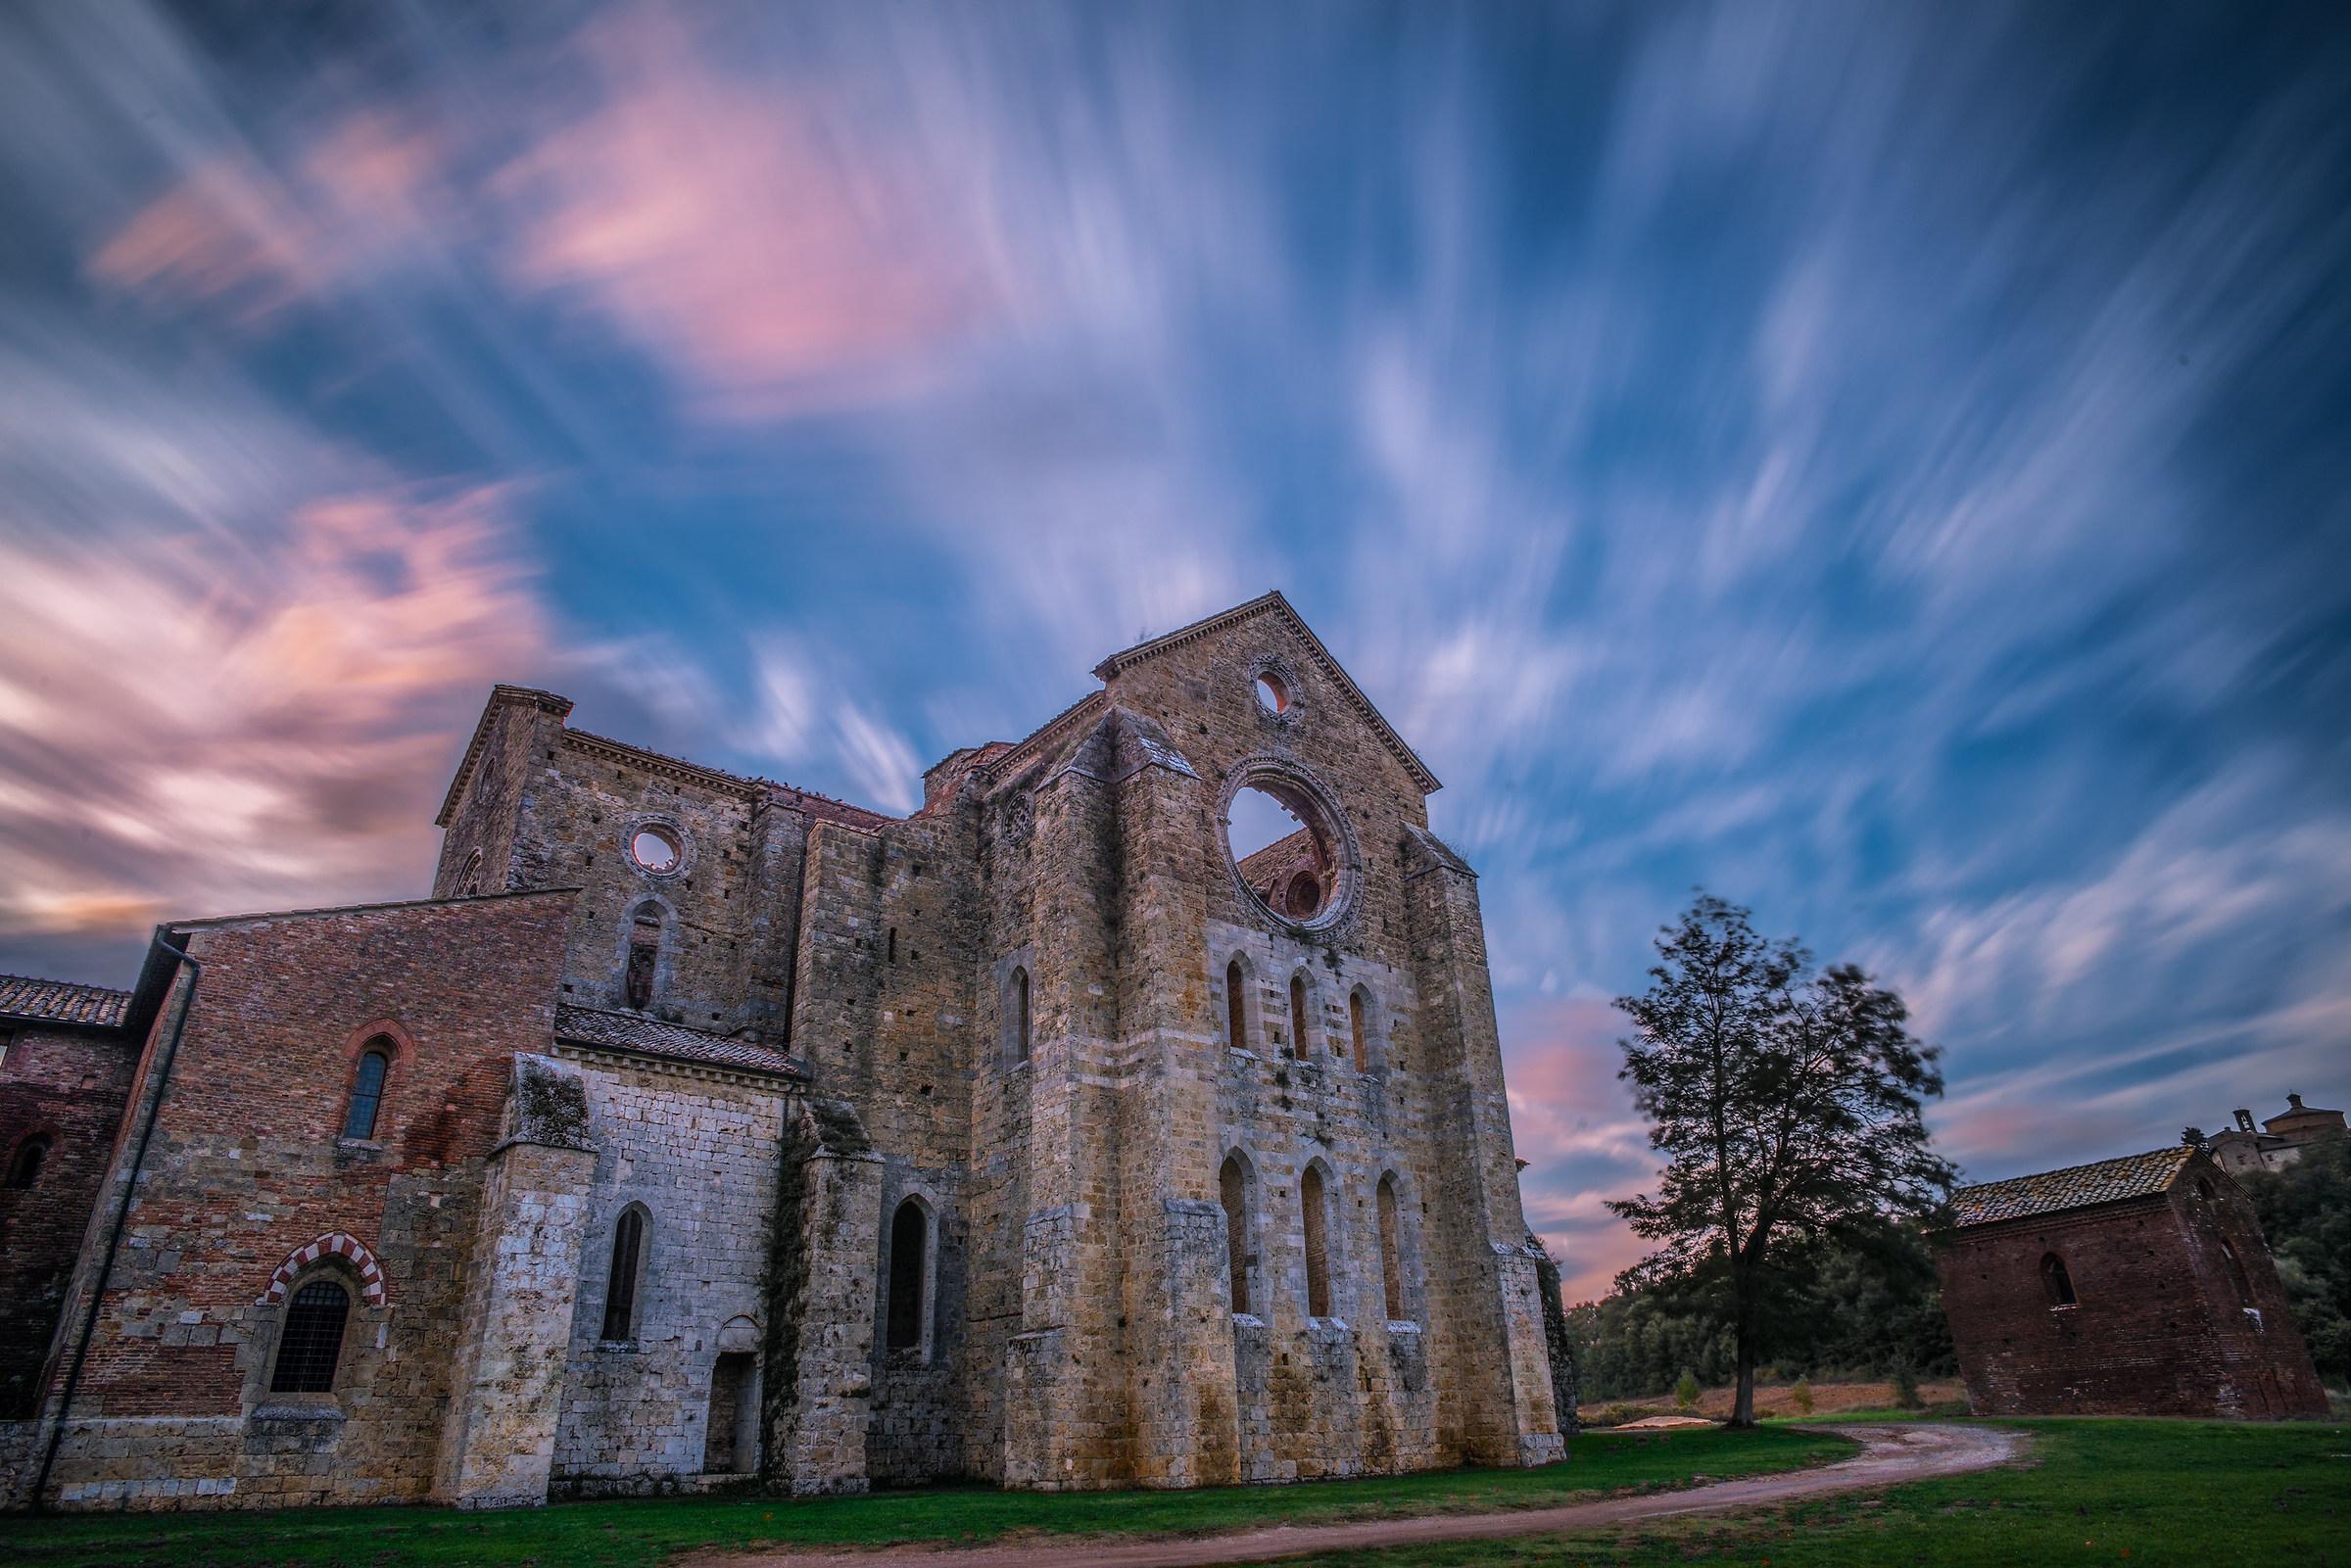 Abbey of San Galgano...